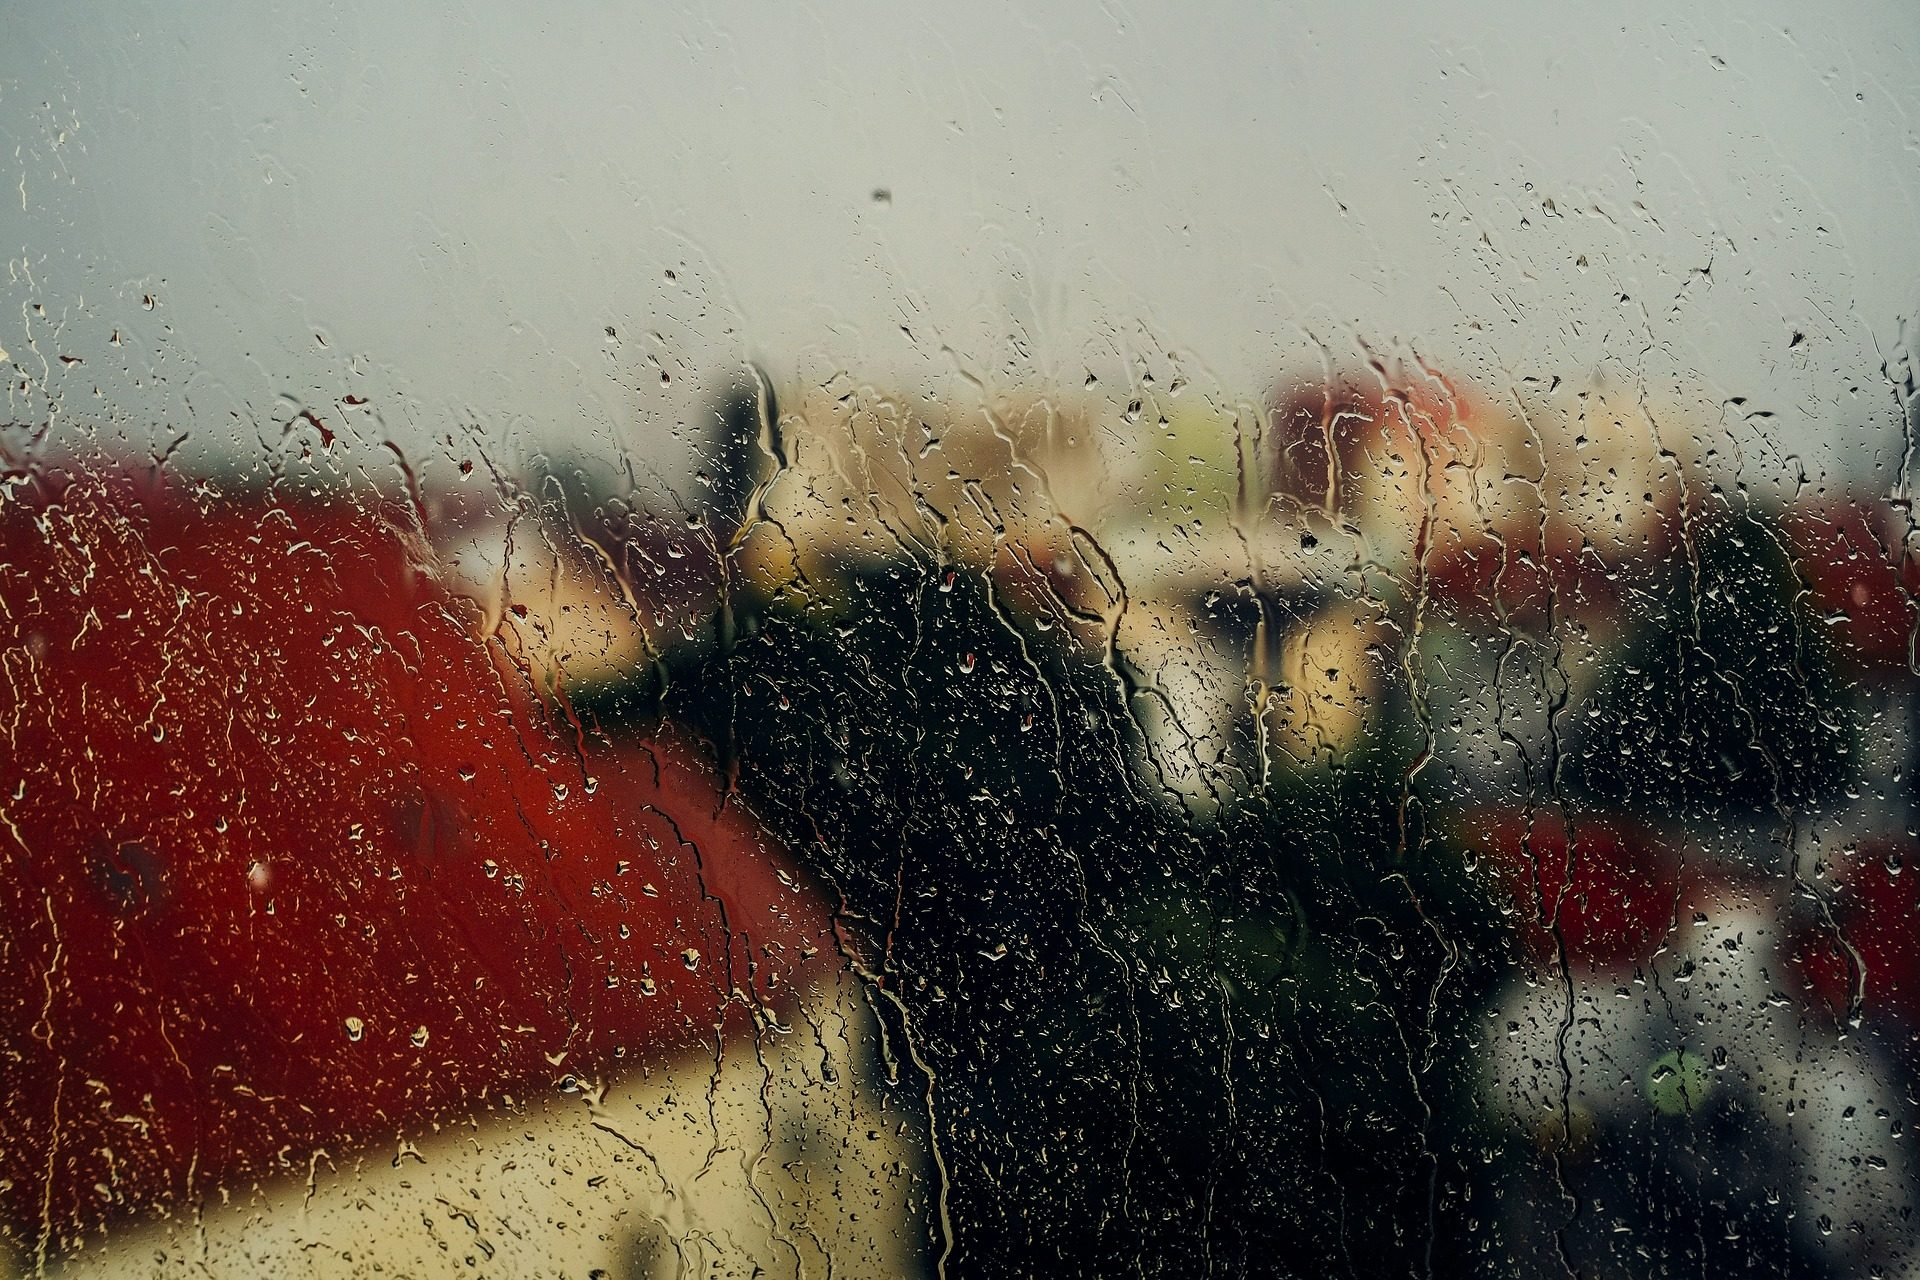 विंडो, पानी, वर्षा, बूँदें, मकान, borroso, desenfocado - HD वॉलपेपर - प्रोफेसर-falken.com